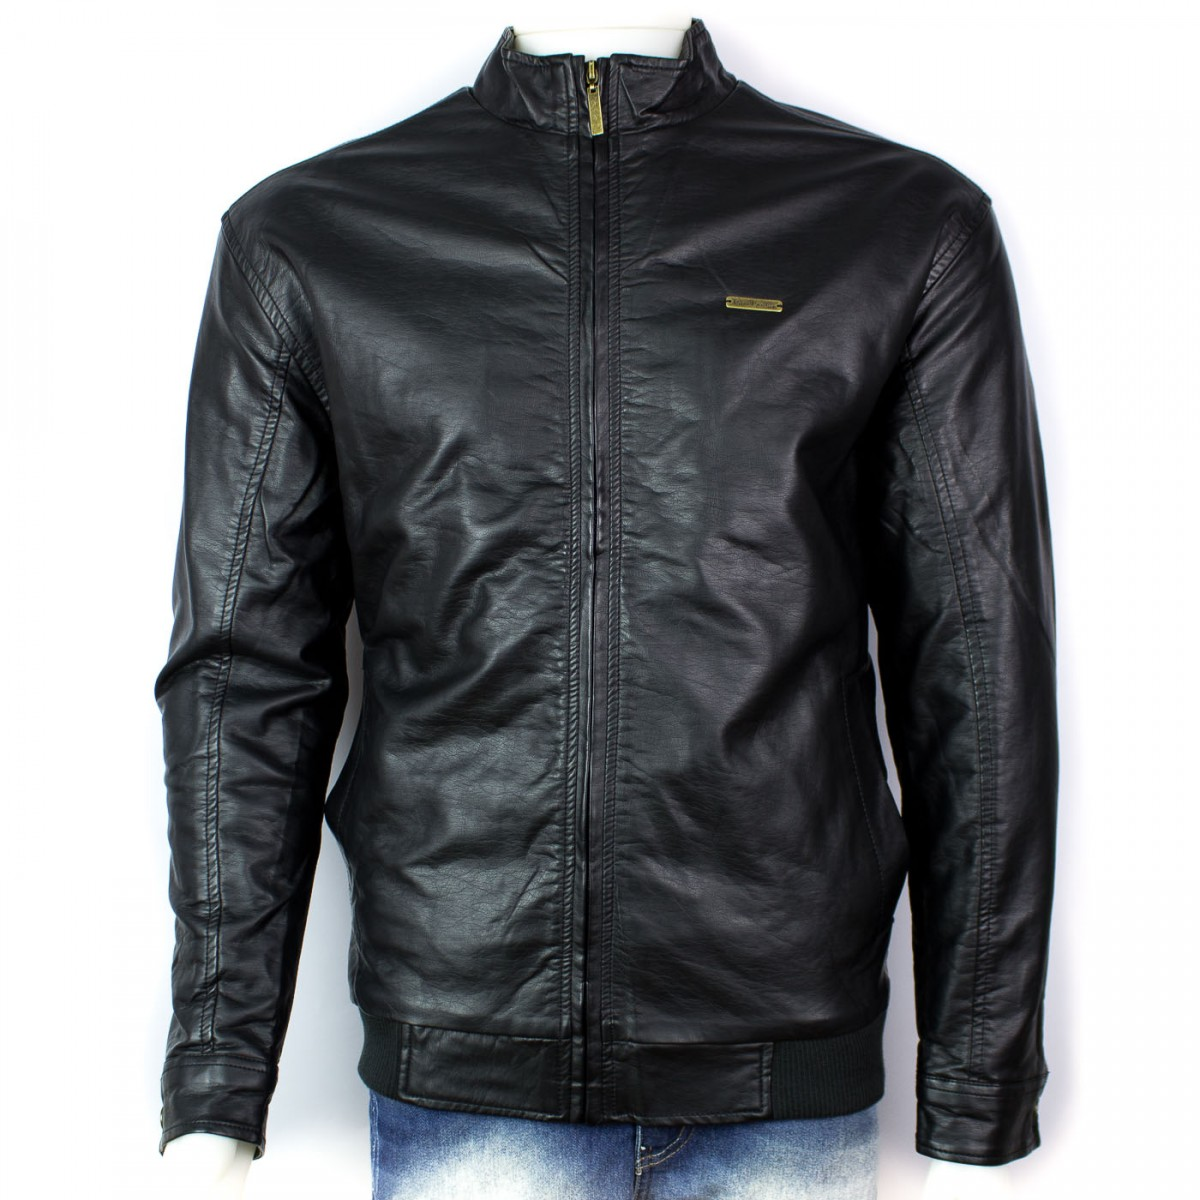 Bizz Store - Jaqueta De Couro Masculina Pierre Cardin Preta c9e2a9e2755